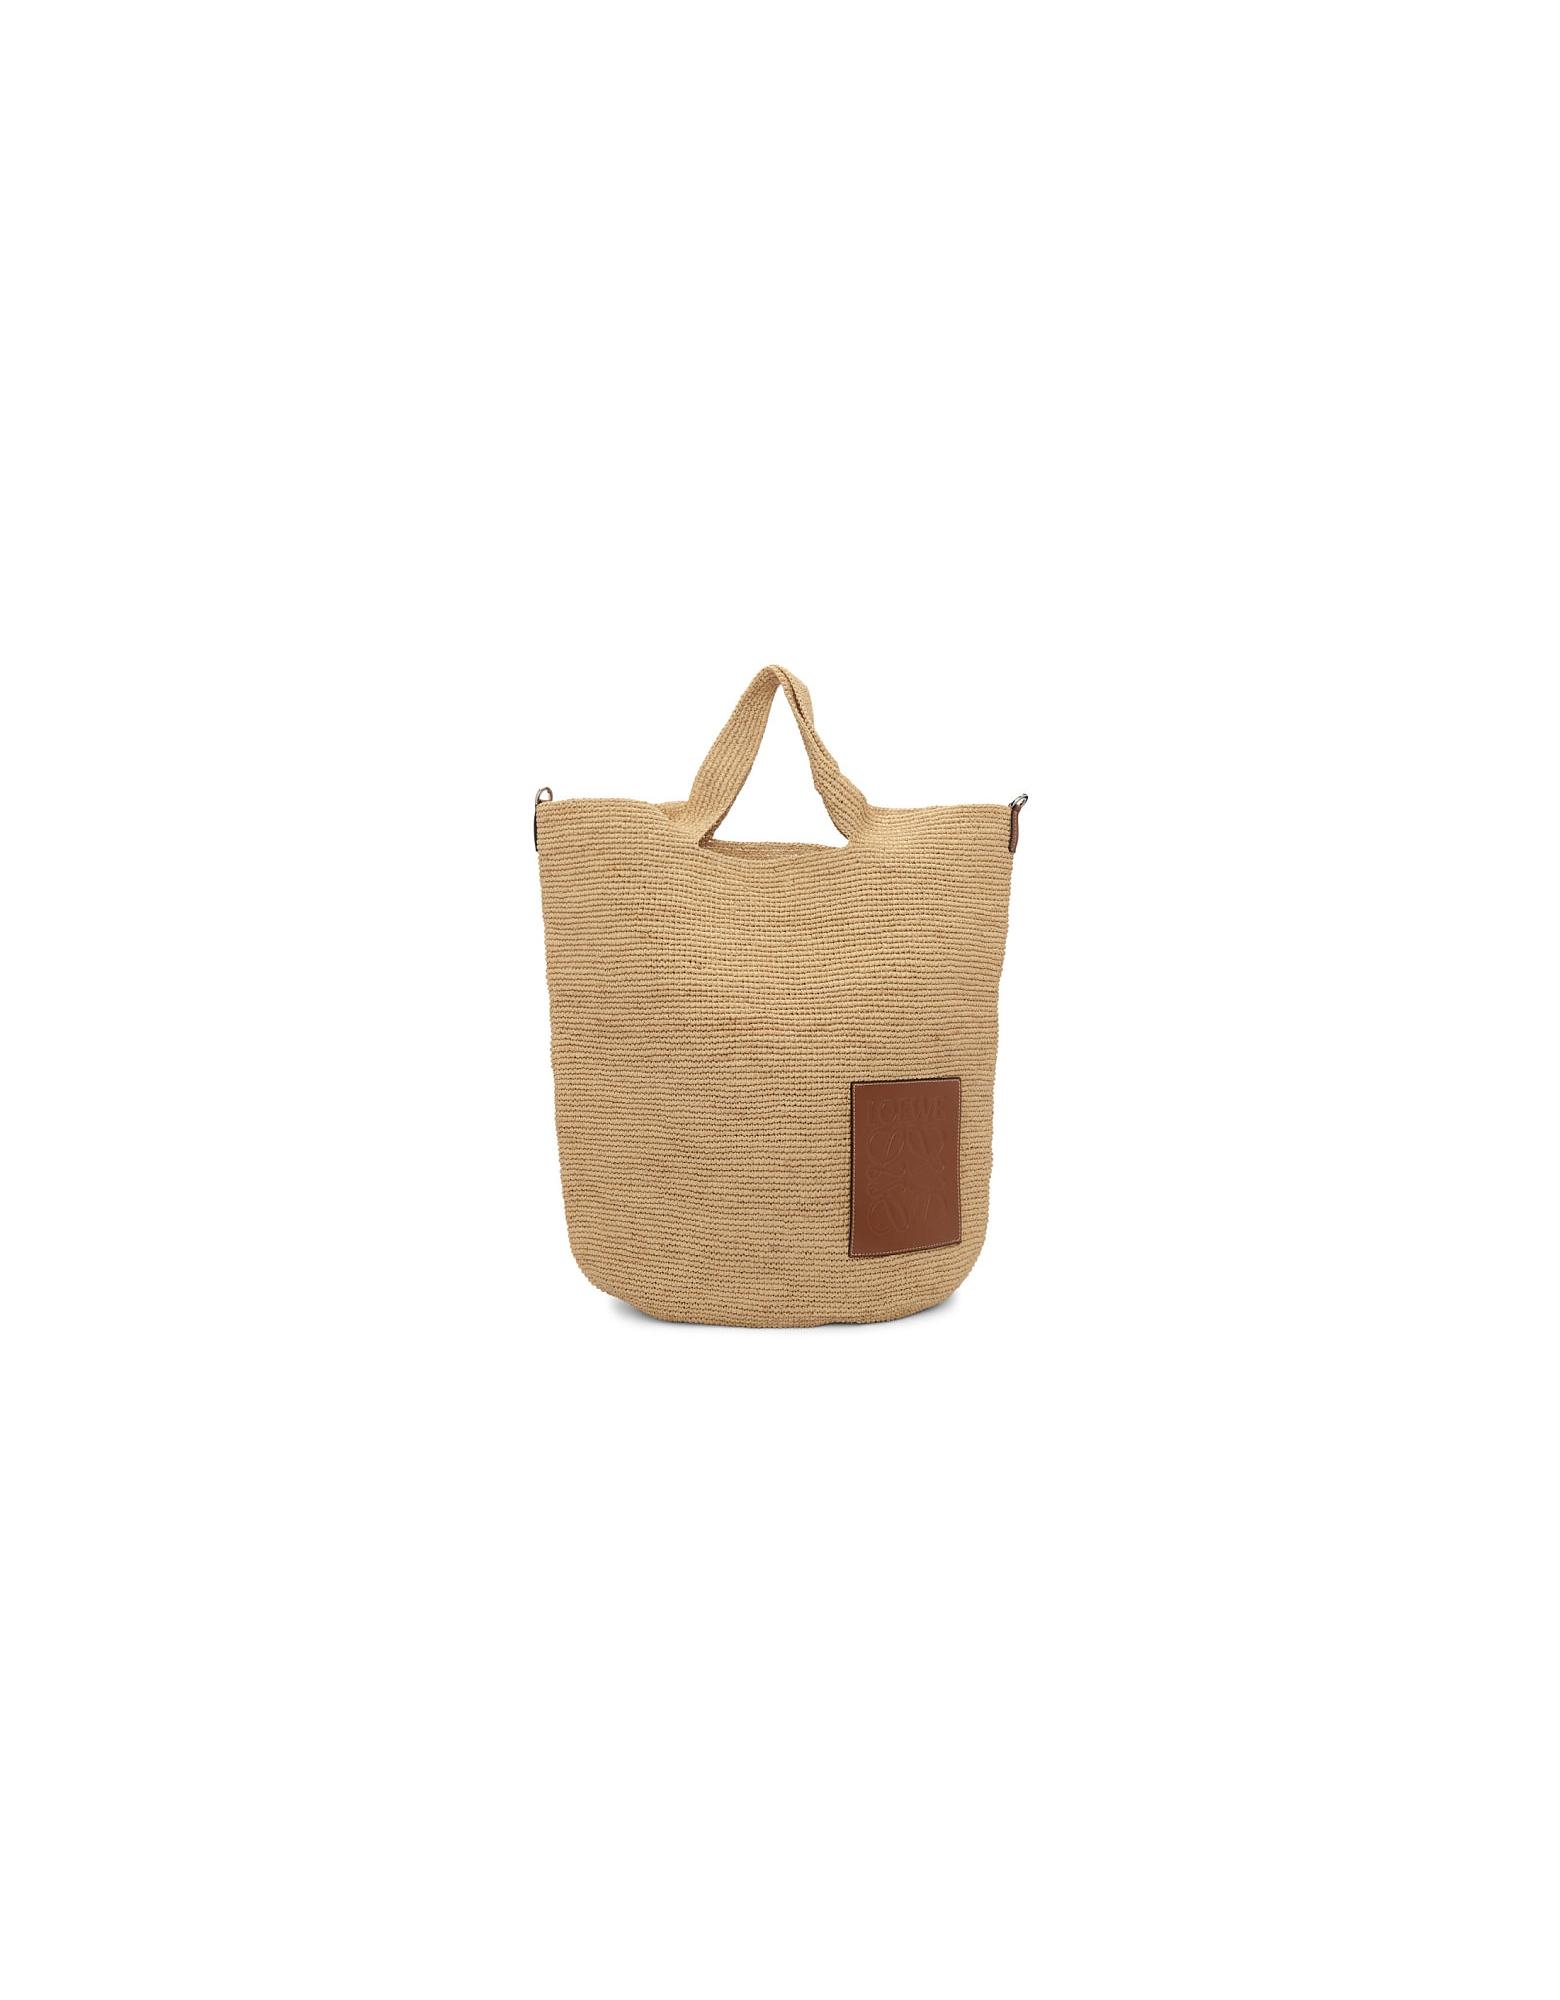 Loewe Designer Handbags, Beige and Tan Large Raffia Slit Bag